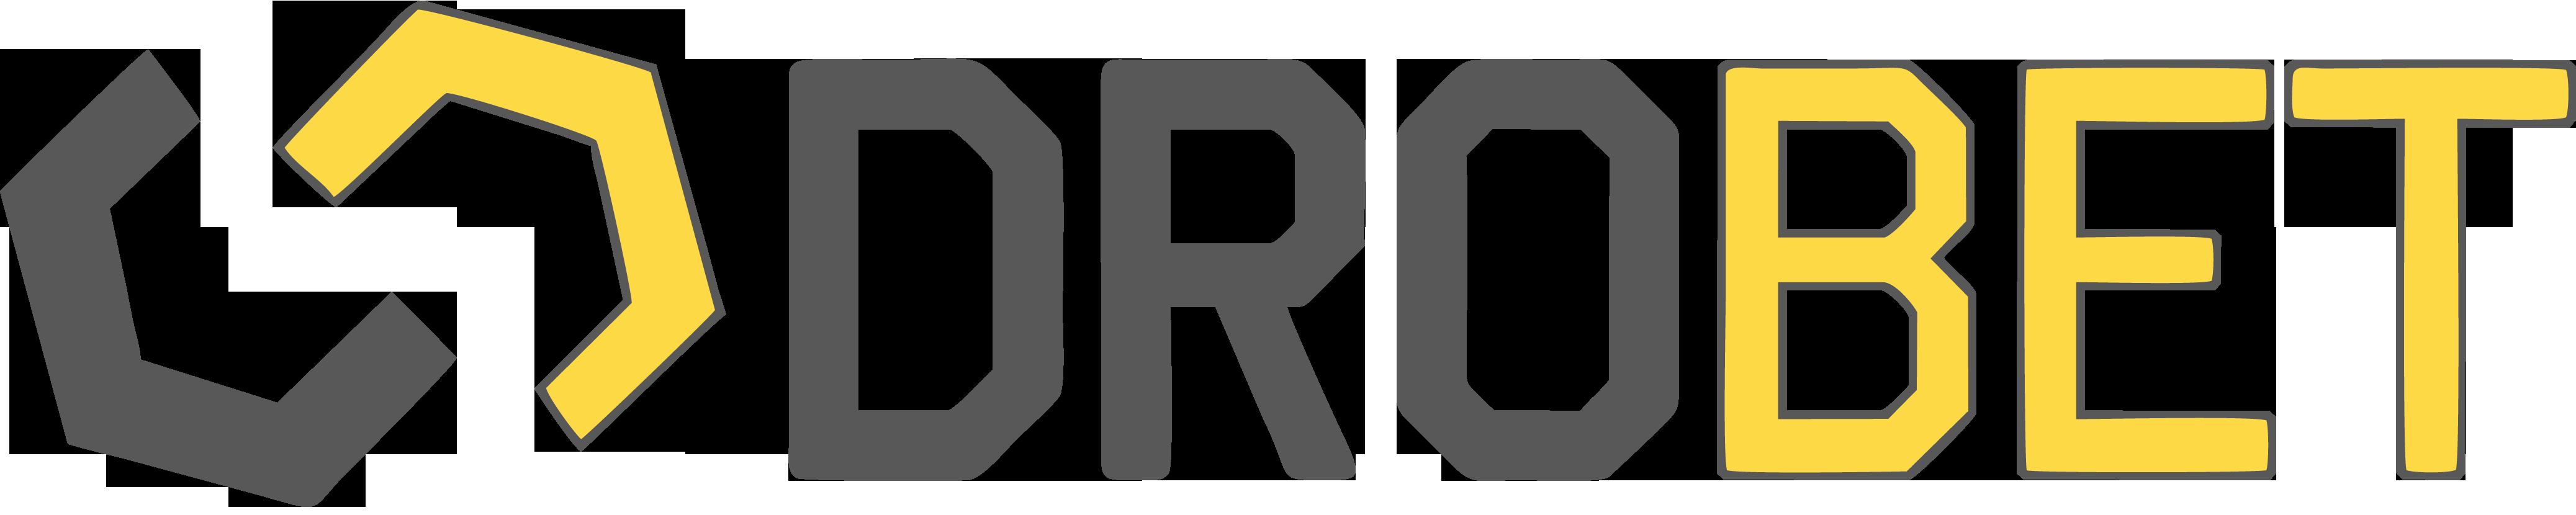 DROBET Toruń - Firma brukarska